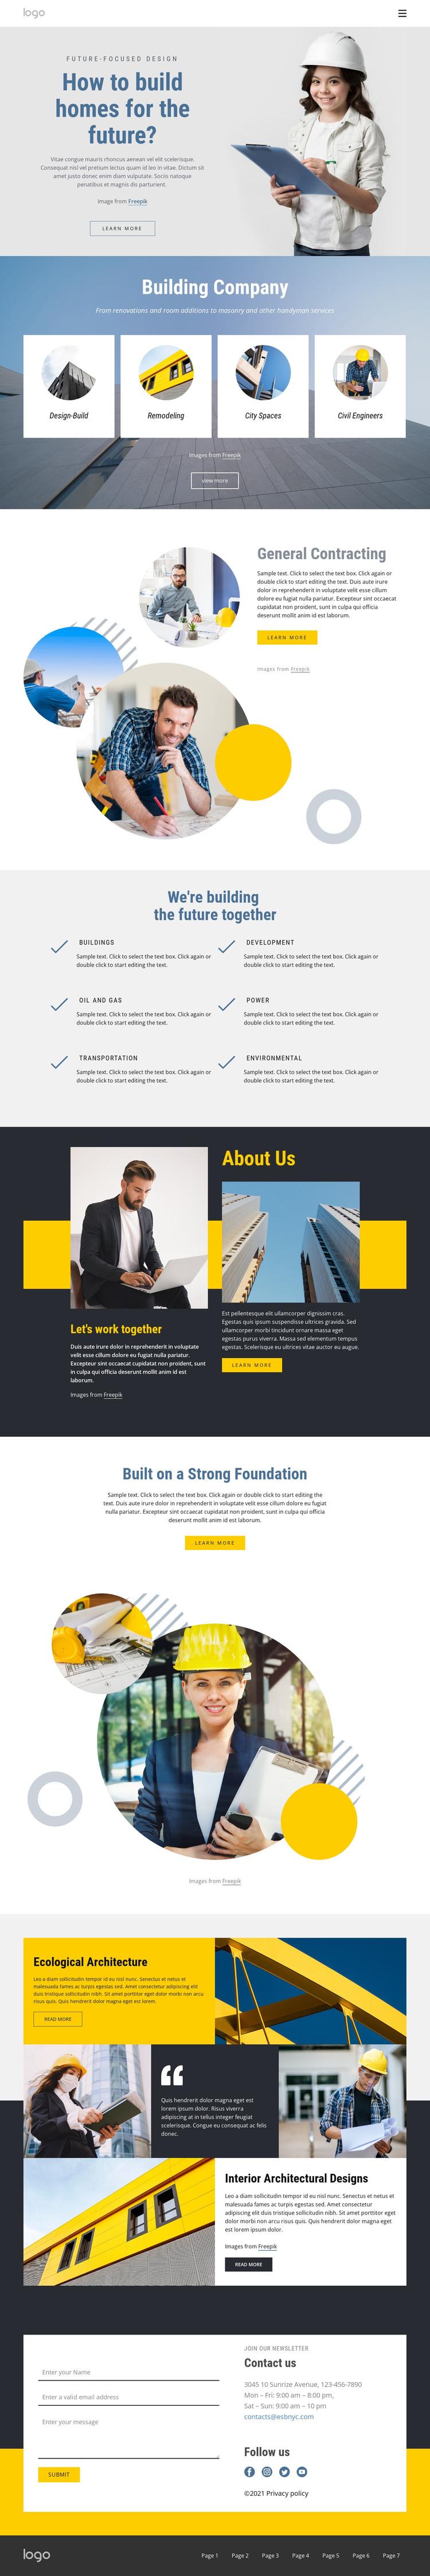 General contracting company Web Design